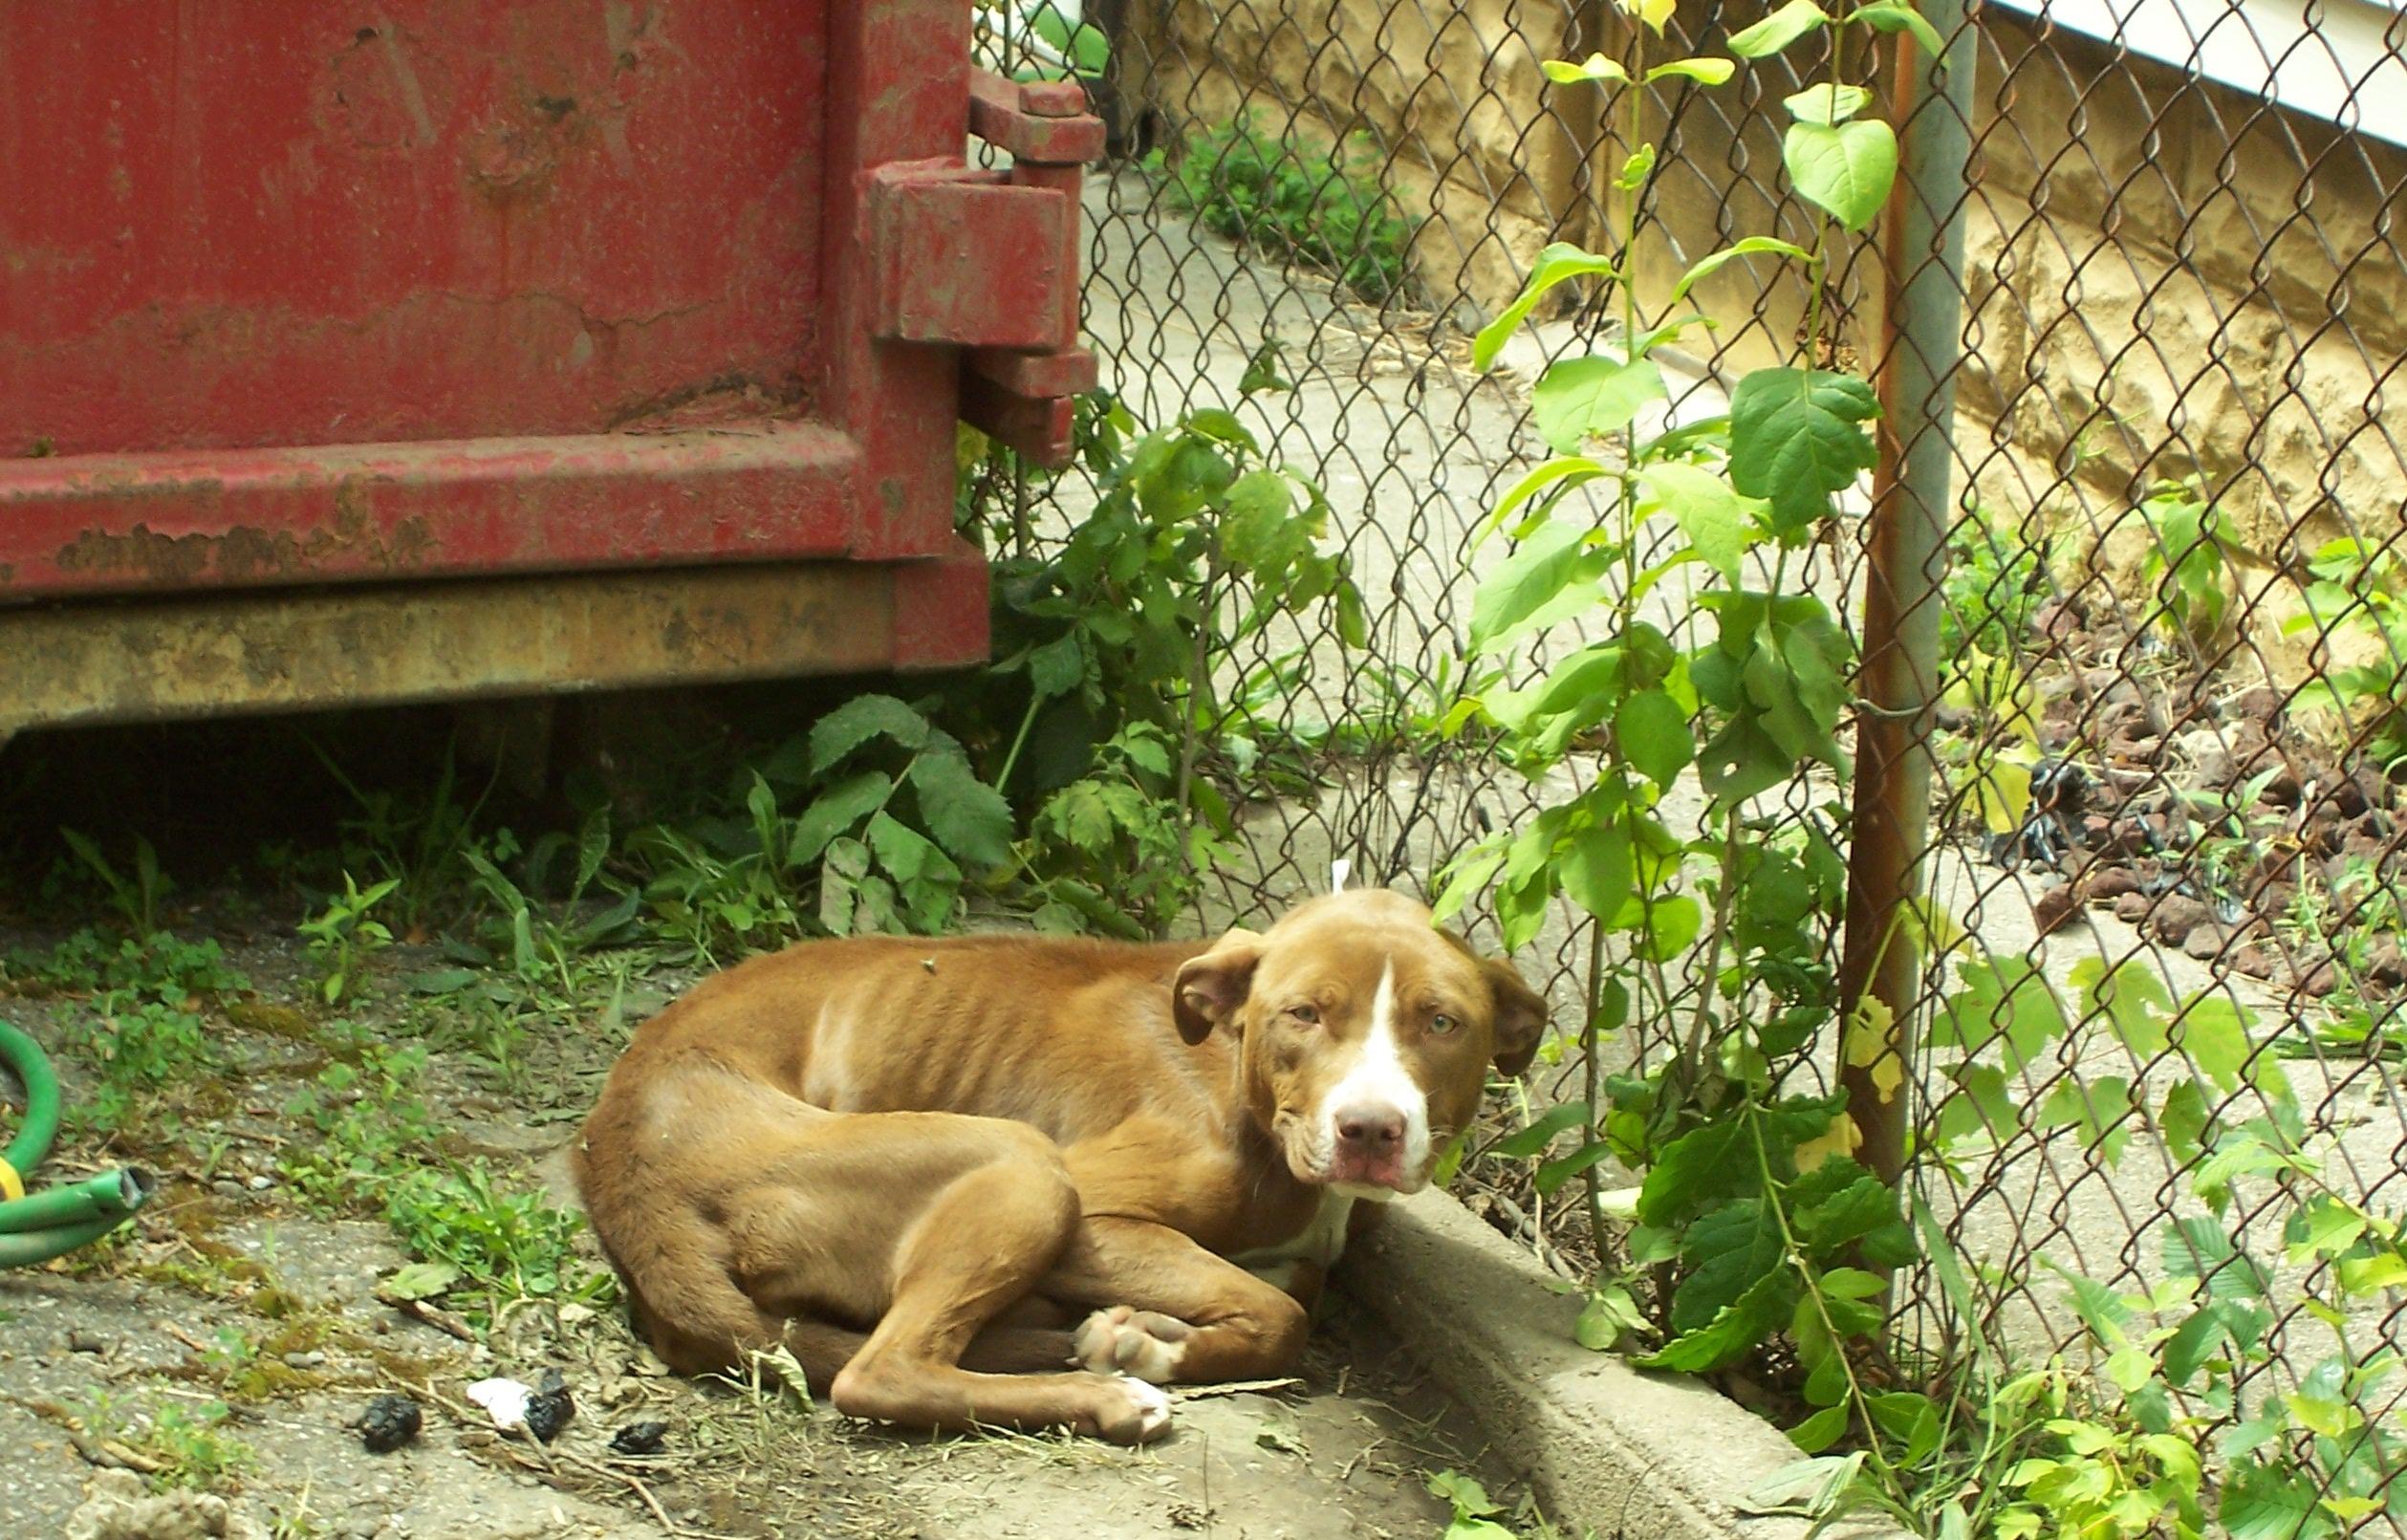 Dog Rescue Supplies